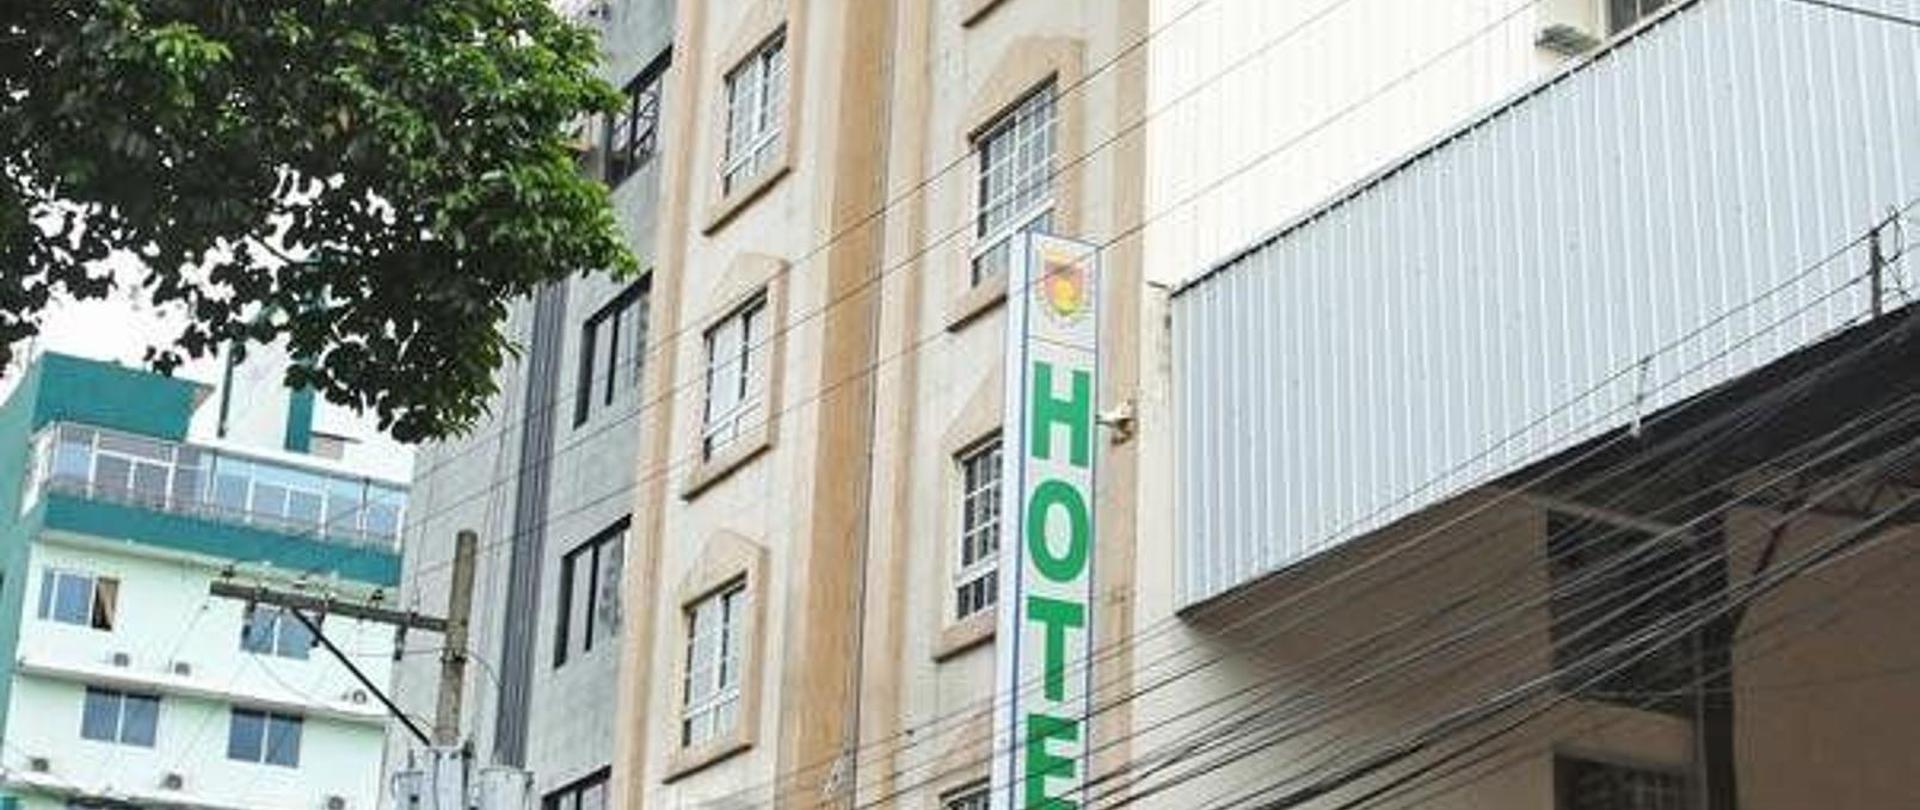 hotel-san-remo-homepage-1.jpg